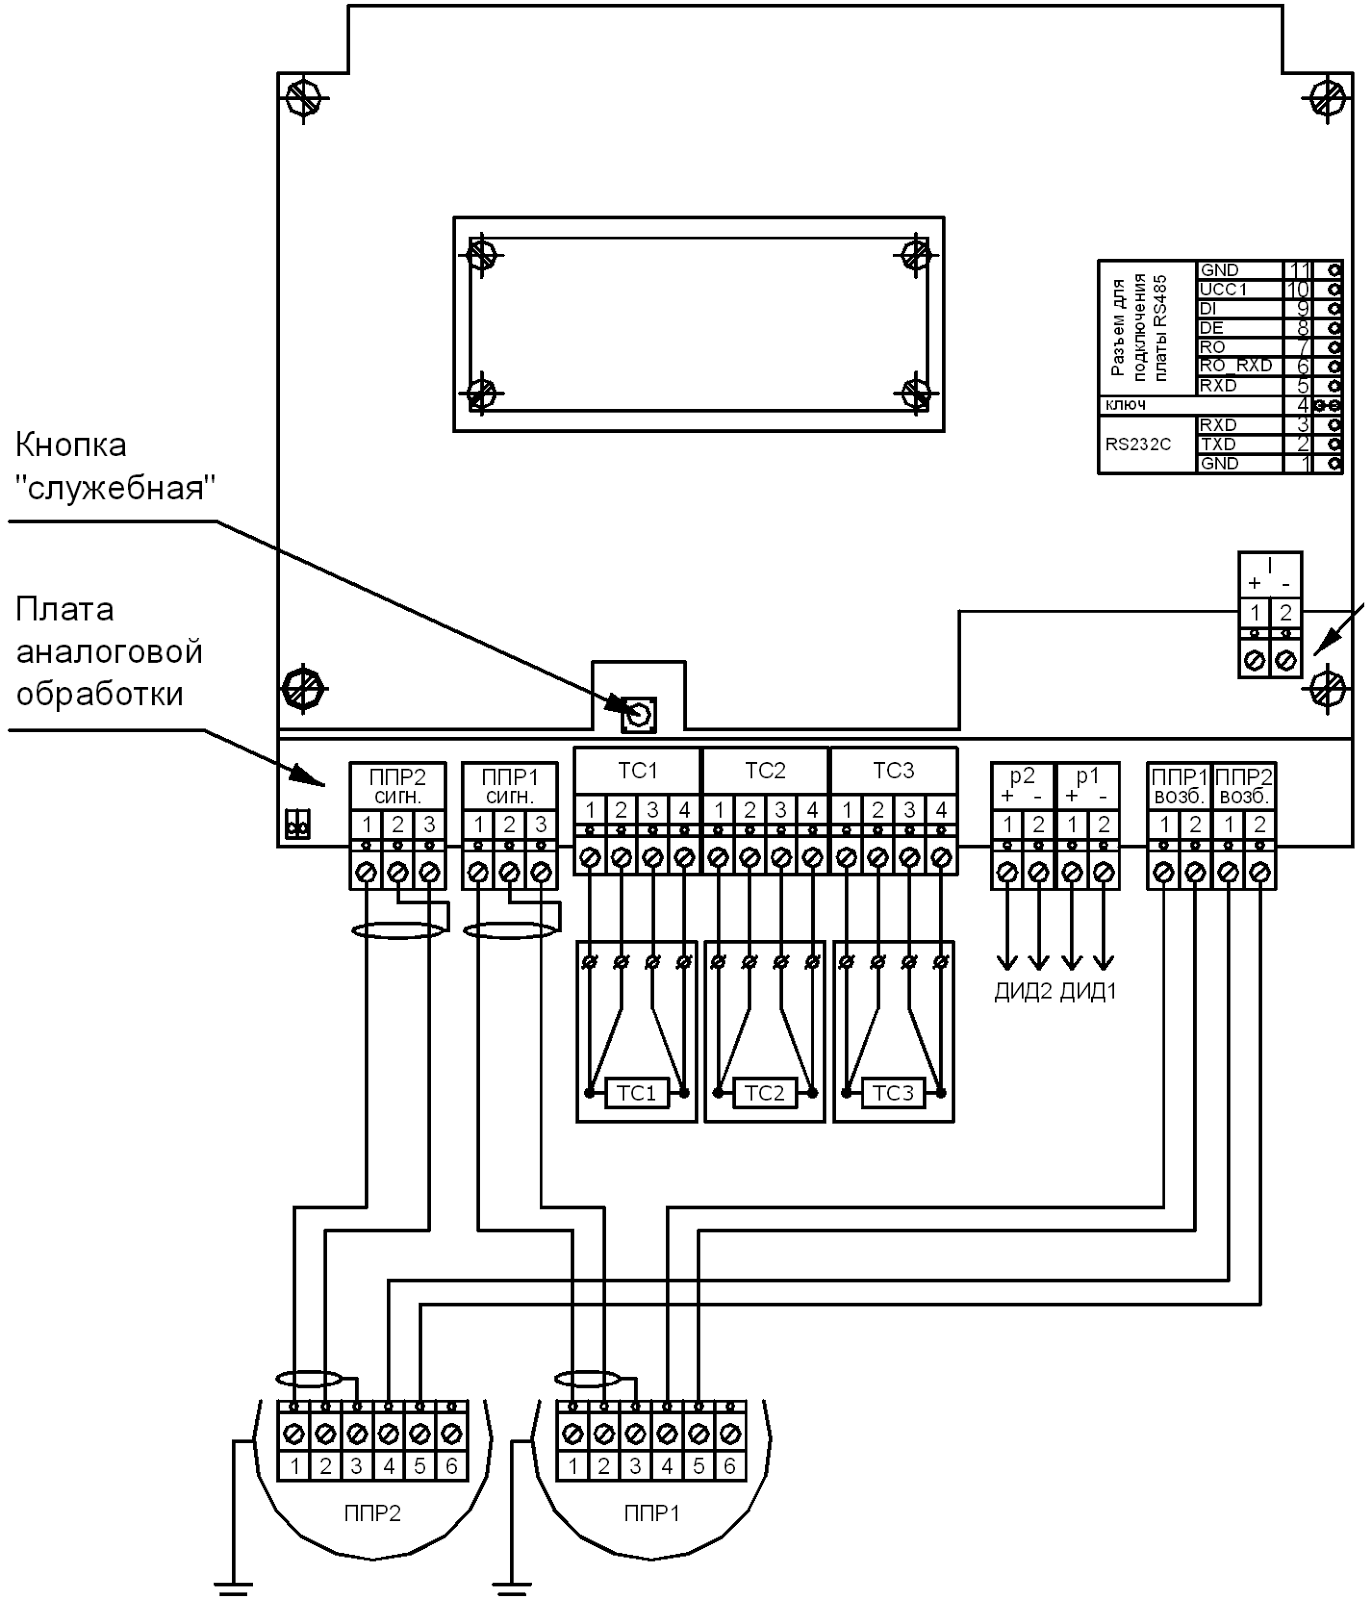 Инструкции по монтажу теплосчетчика тэм 104